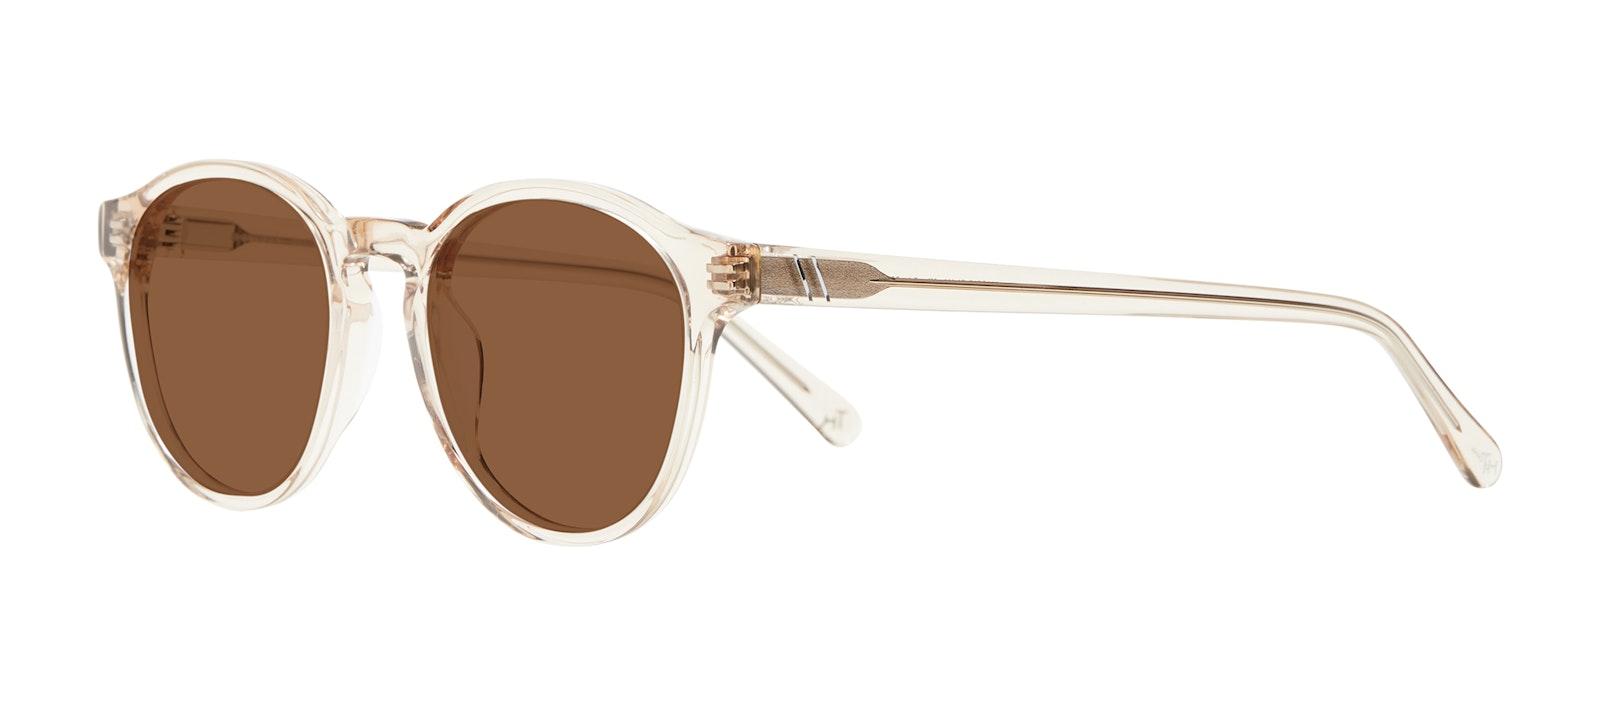 Affordable Fashion Glasses Round Sunglasses Men Aussie Clay Tilt